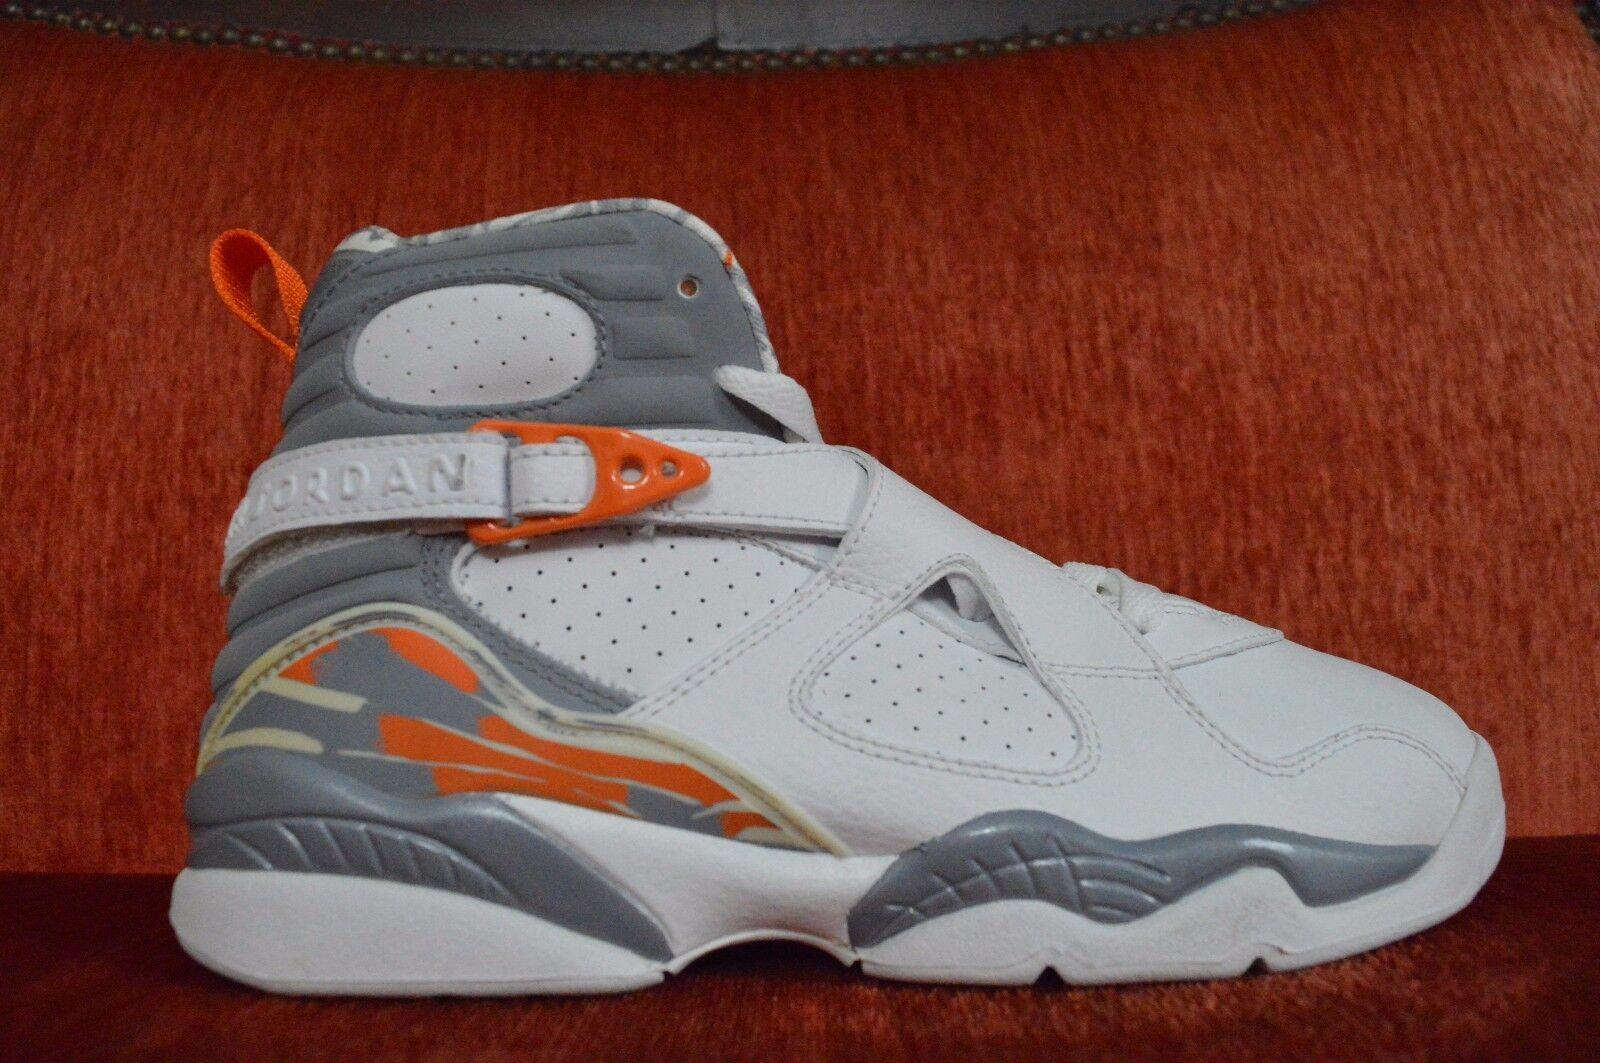 Nike Air Jordan Stealth VIII 305368 102 Size 6.5Y White Playoff Bugs Stealth